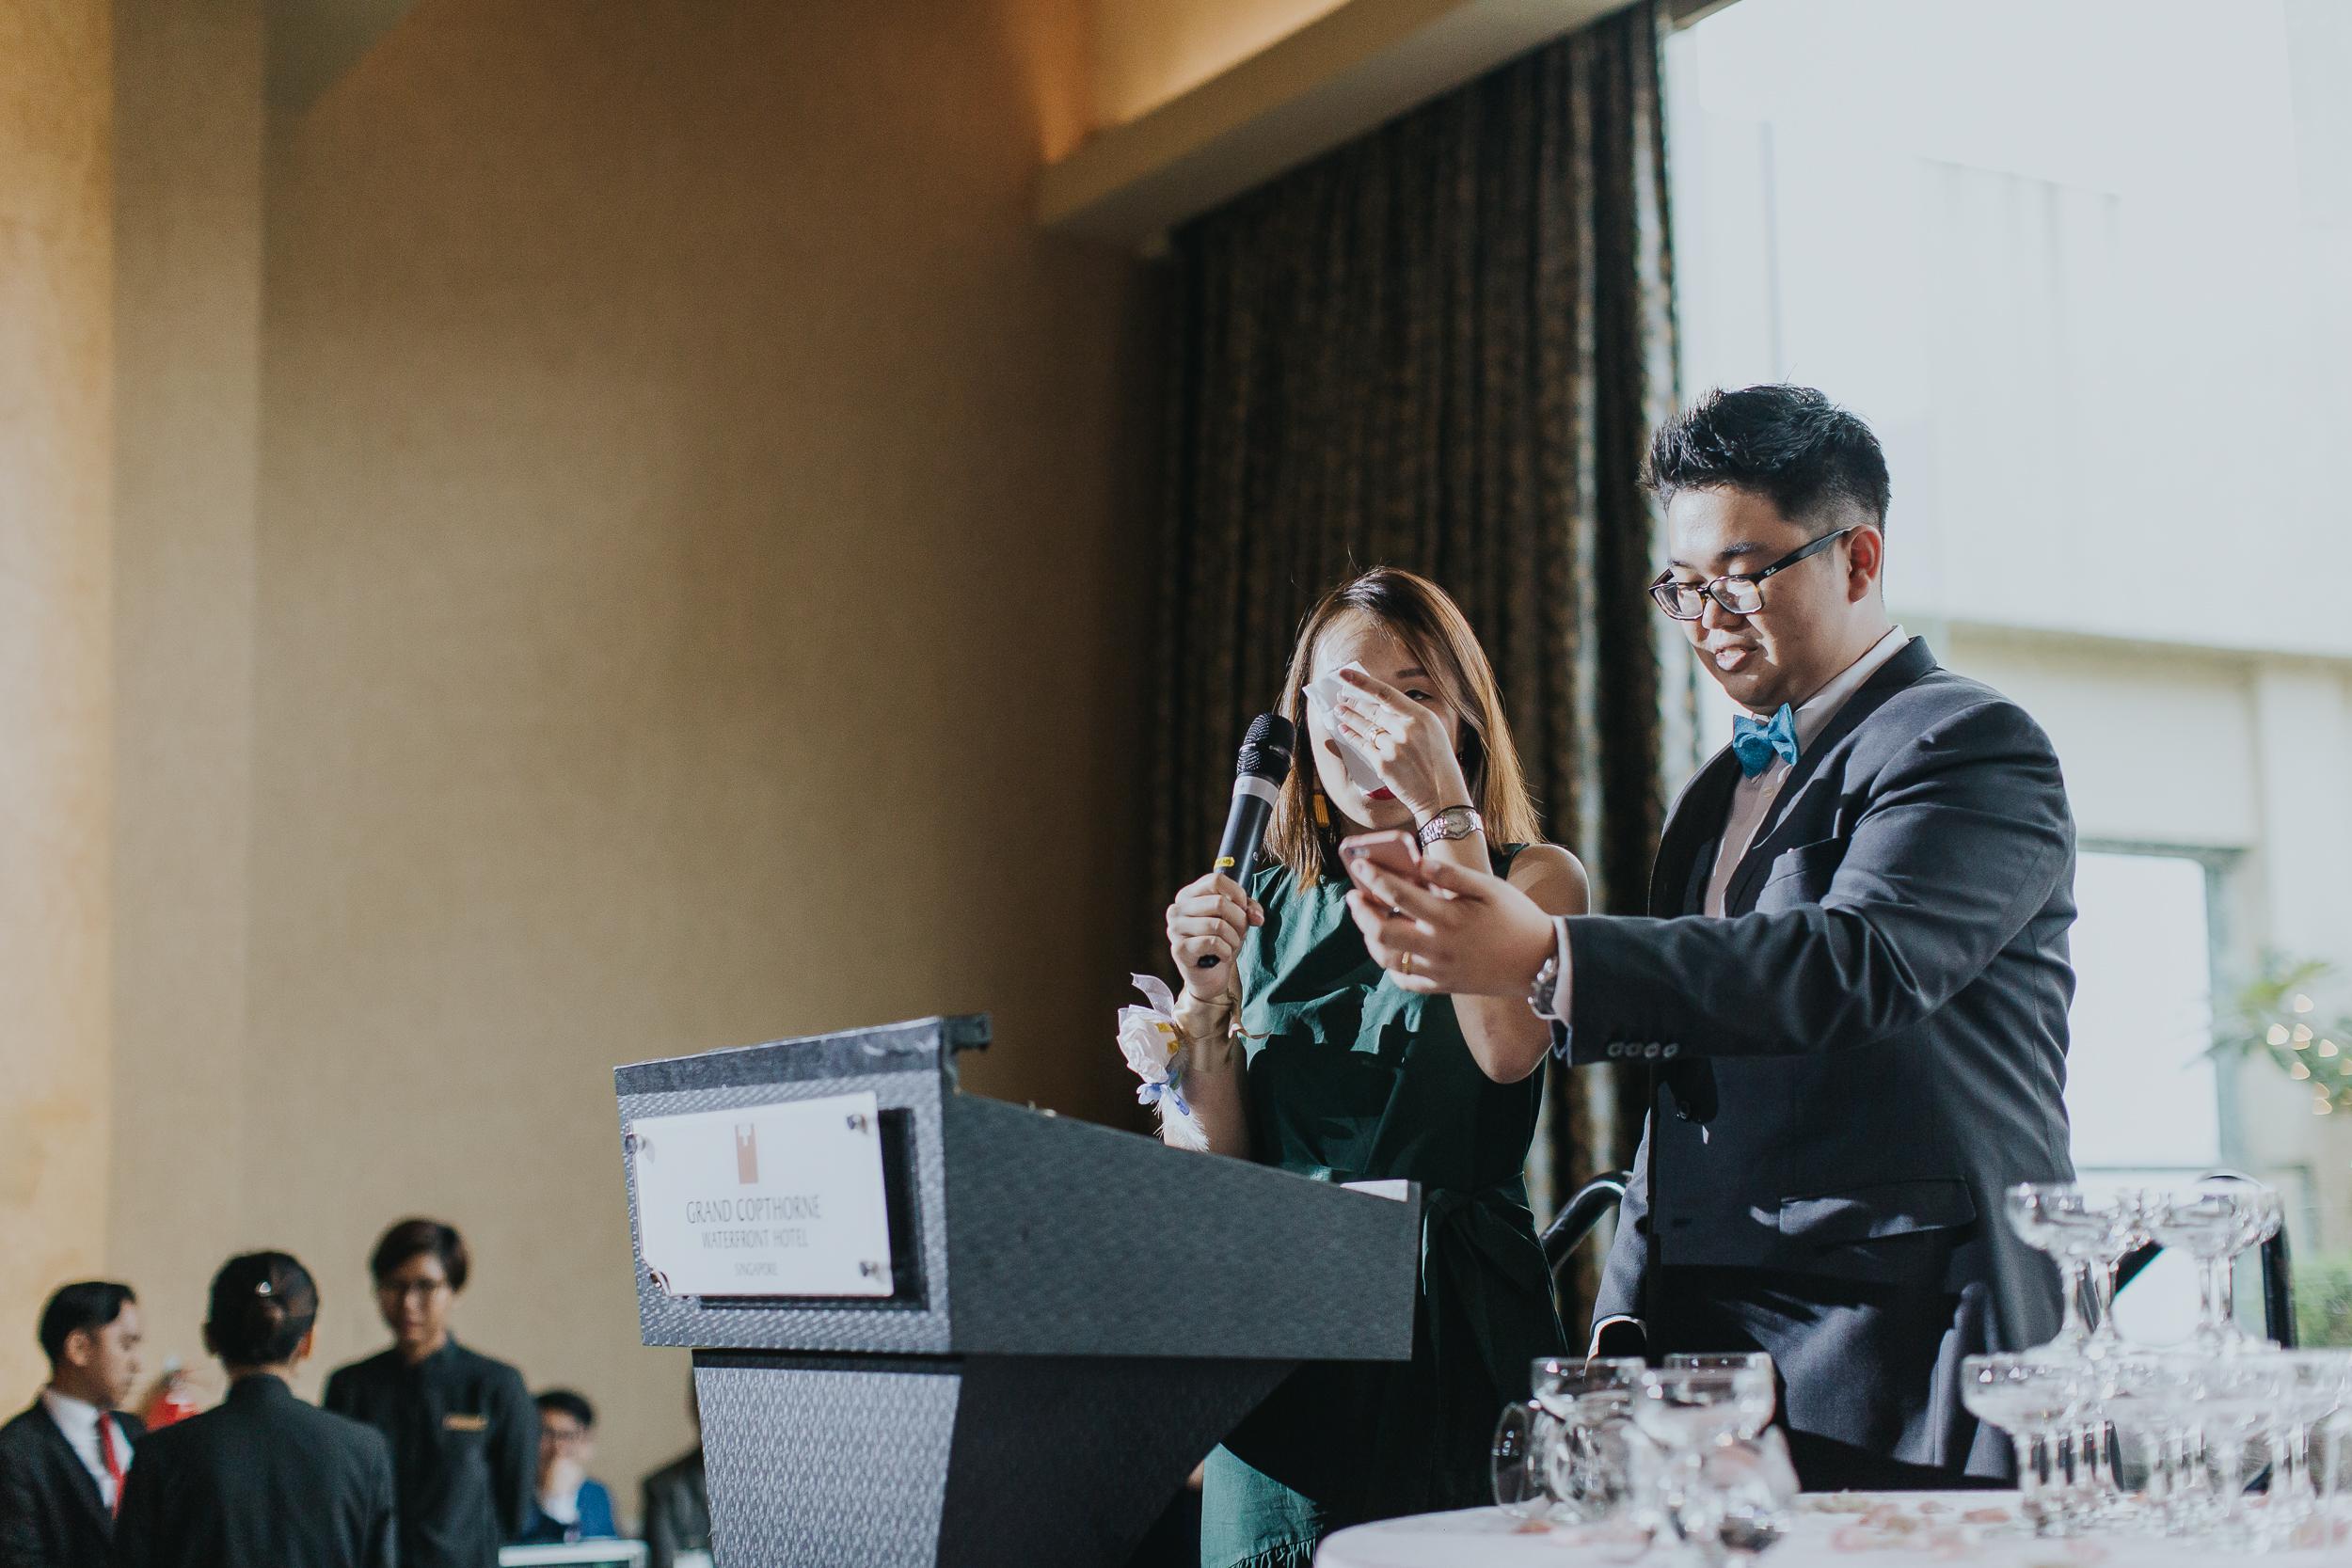 Singapore+Actual+Day+Wedding+Photographer+Grand+Mercure+Oliver+Estelle-0096.jpg